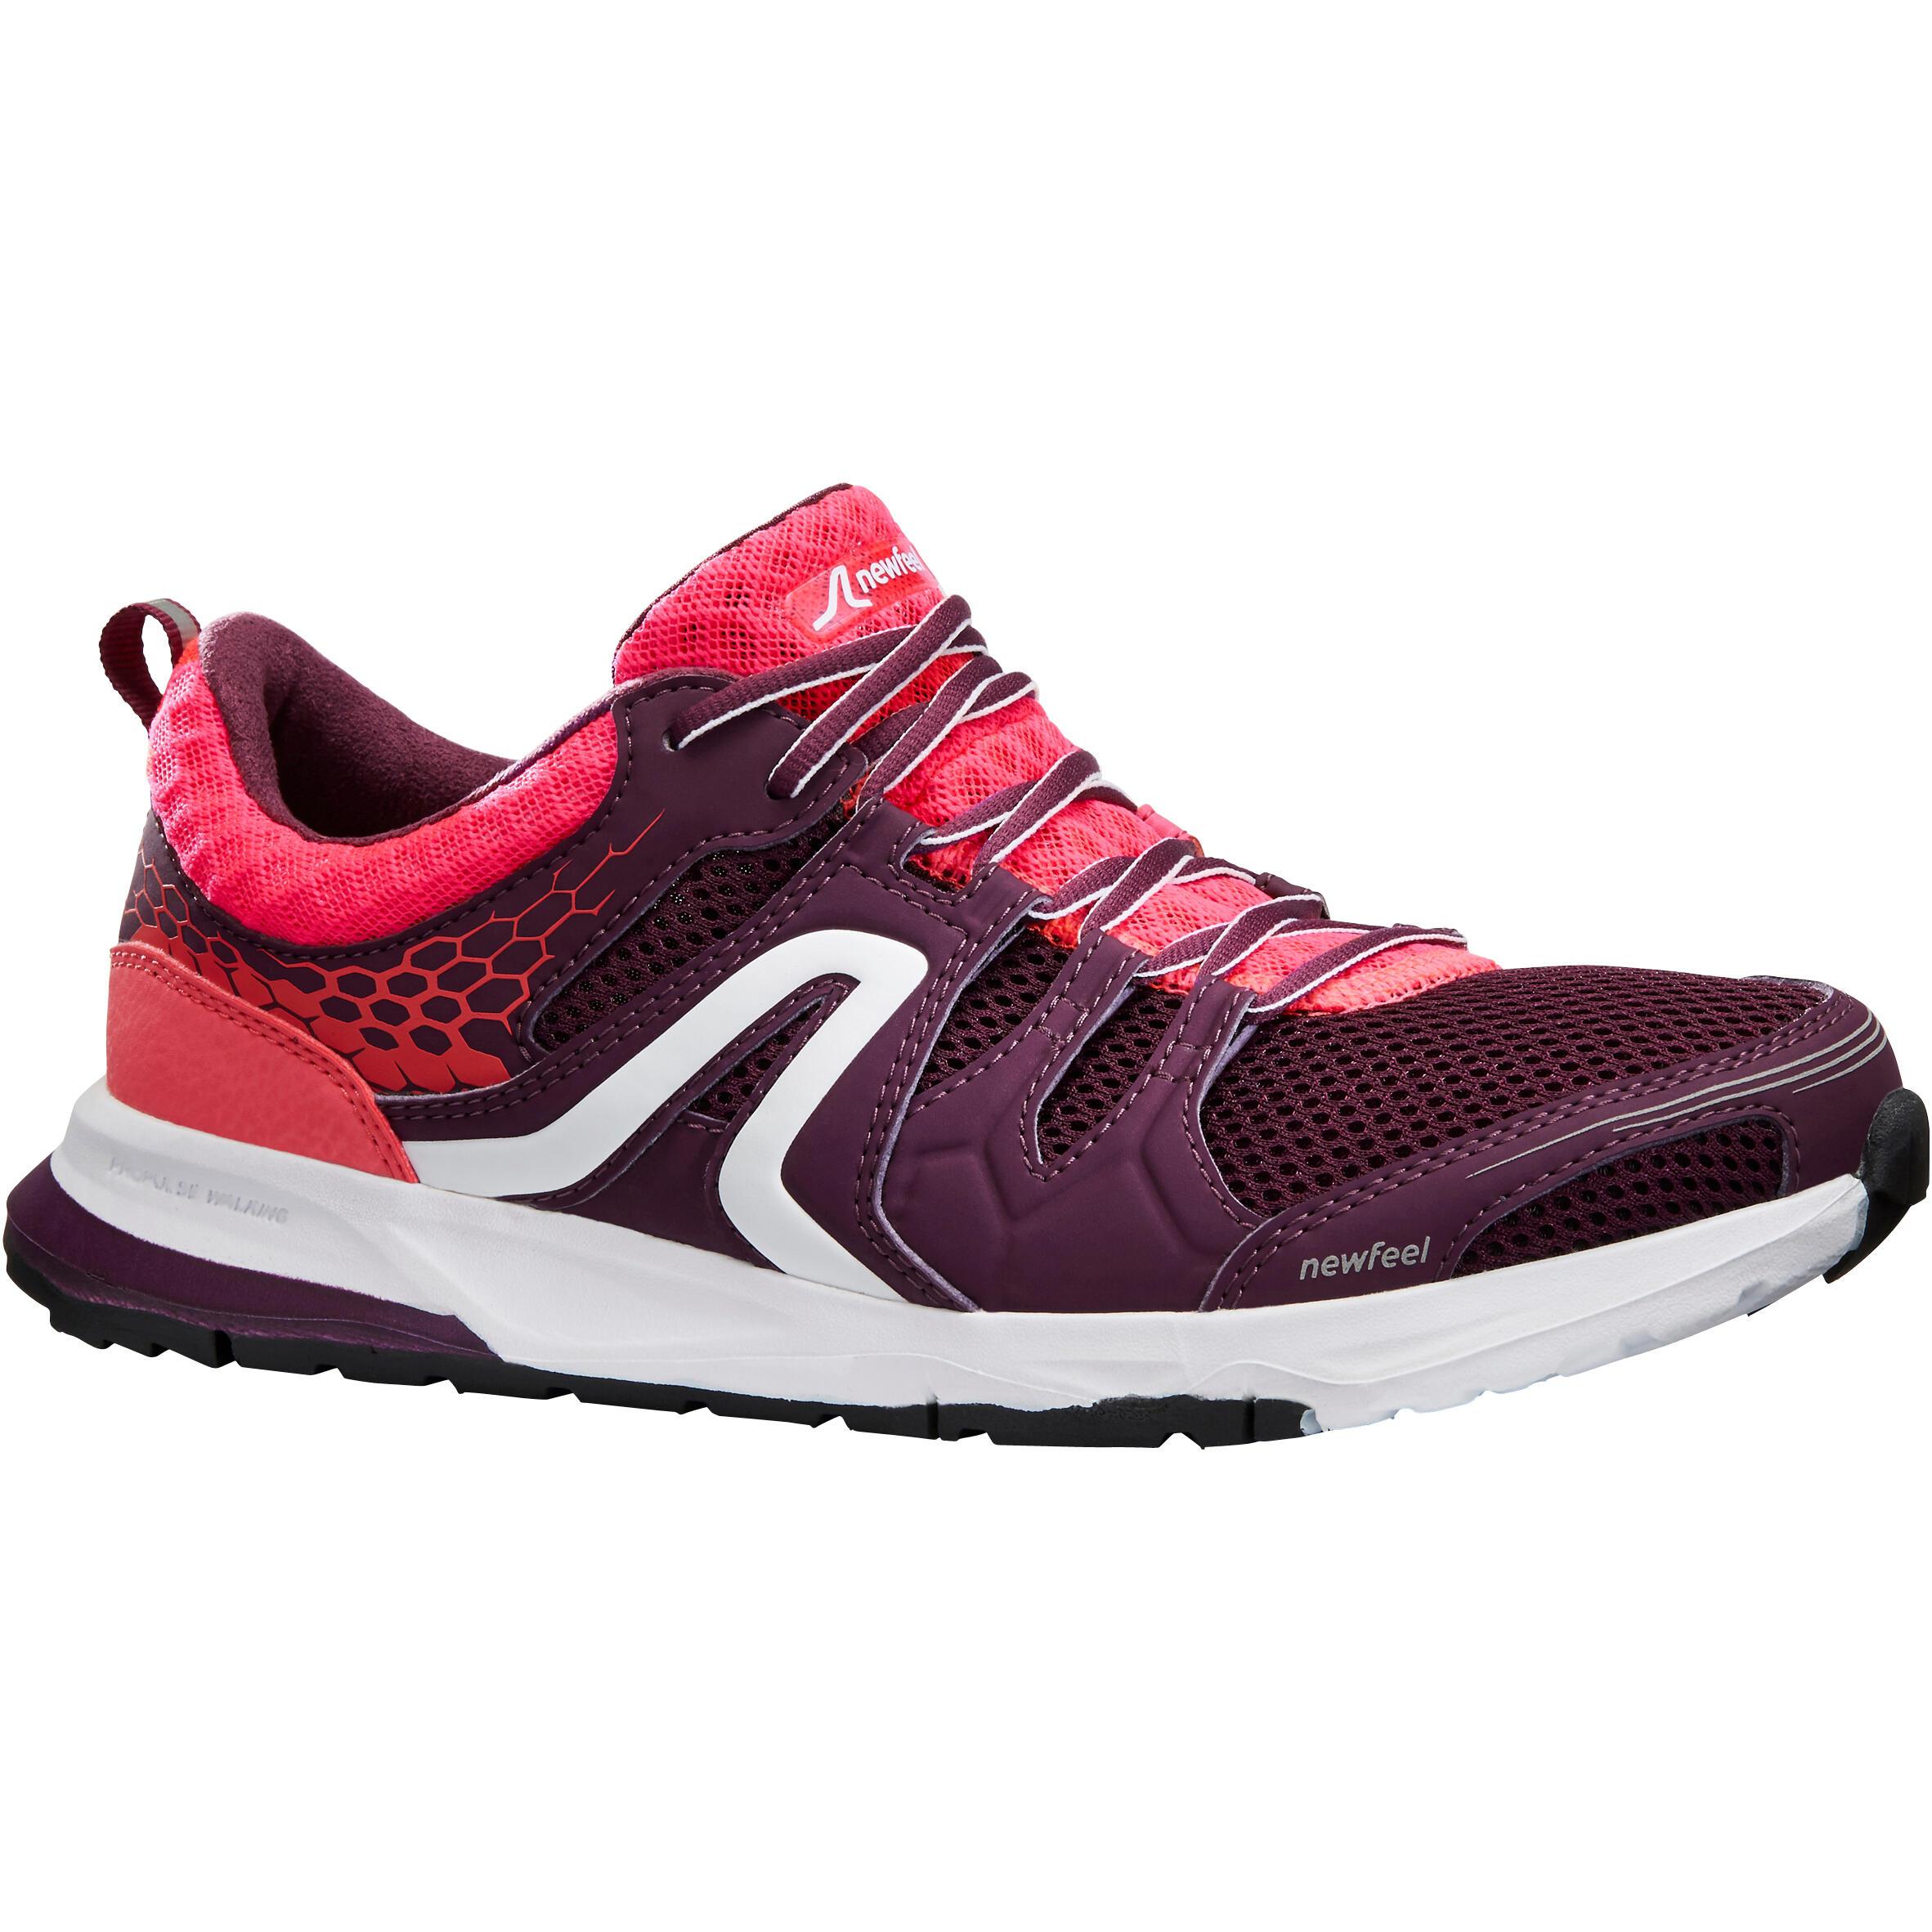 Newfeel Chaussures marche athlétique femme PW 240 violet / rose - Newfeel